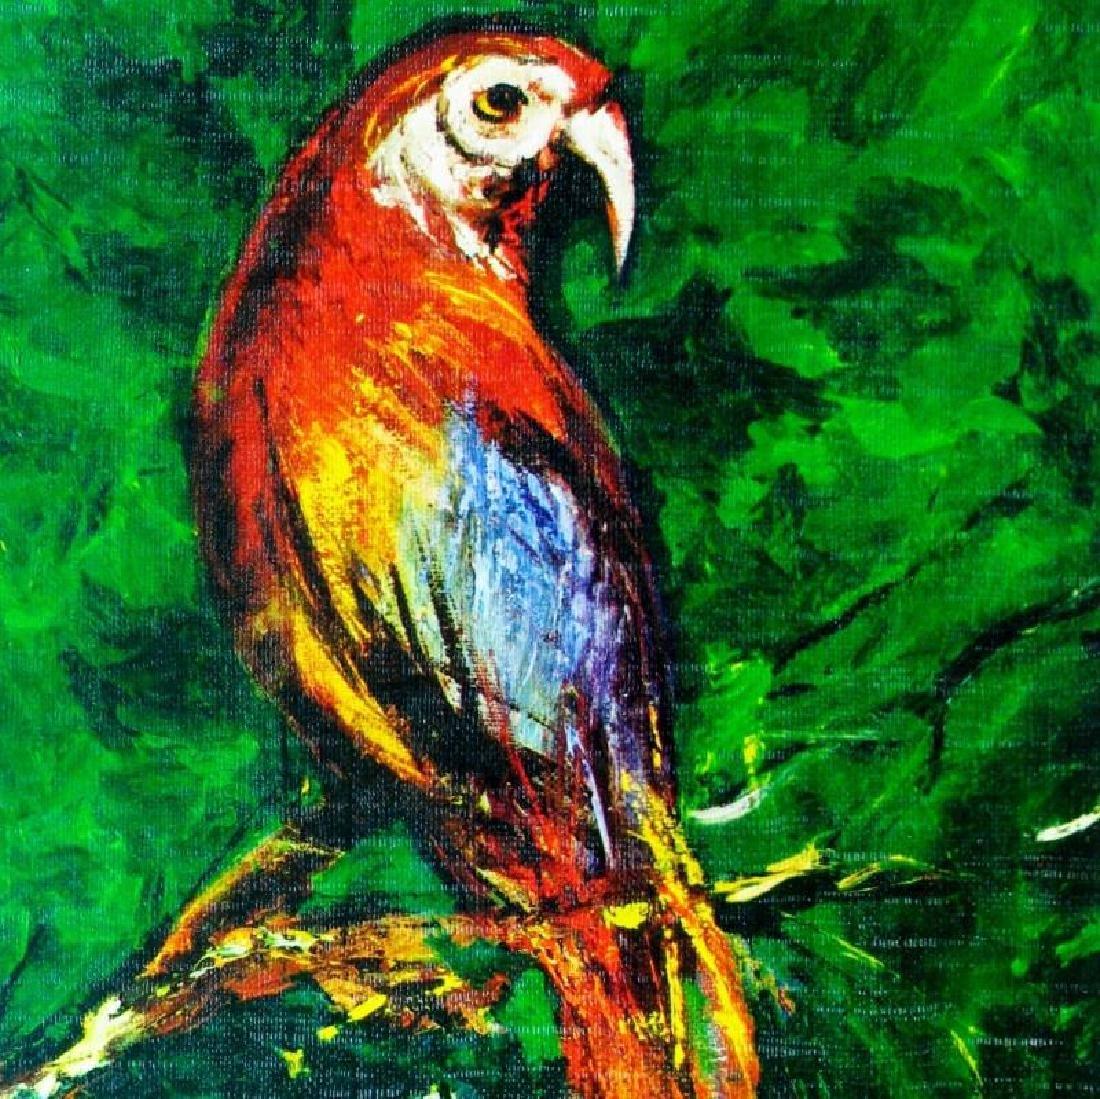 Parrott Lithograph Signed Colorful Art For Sale - 2